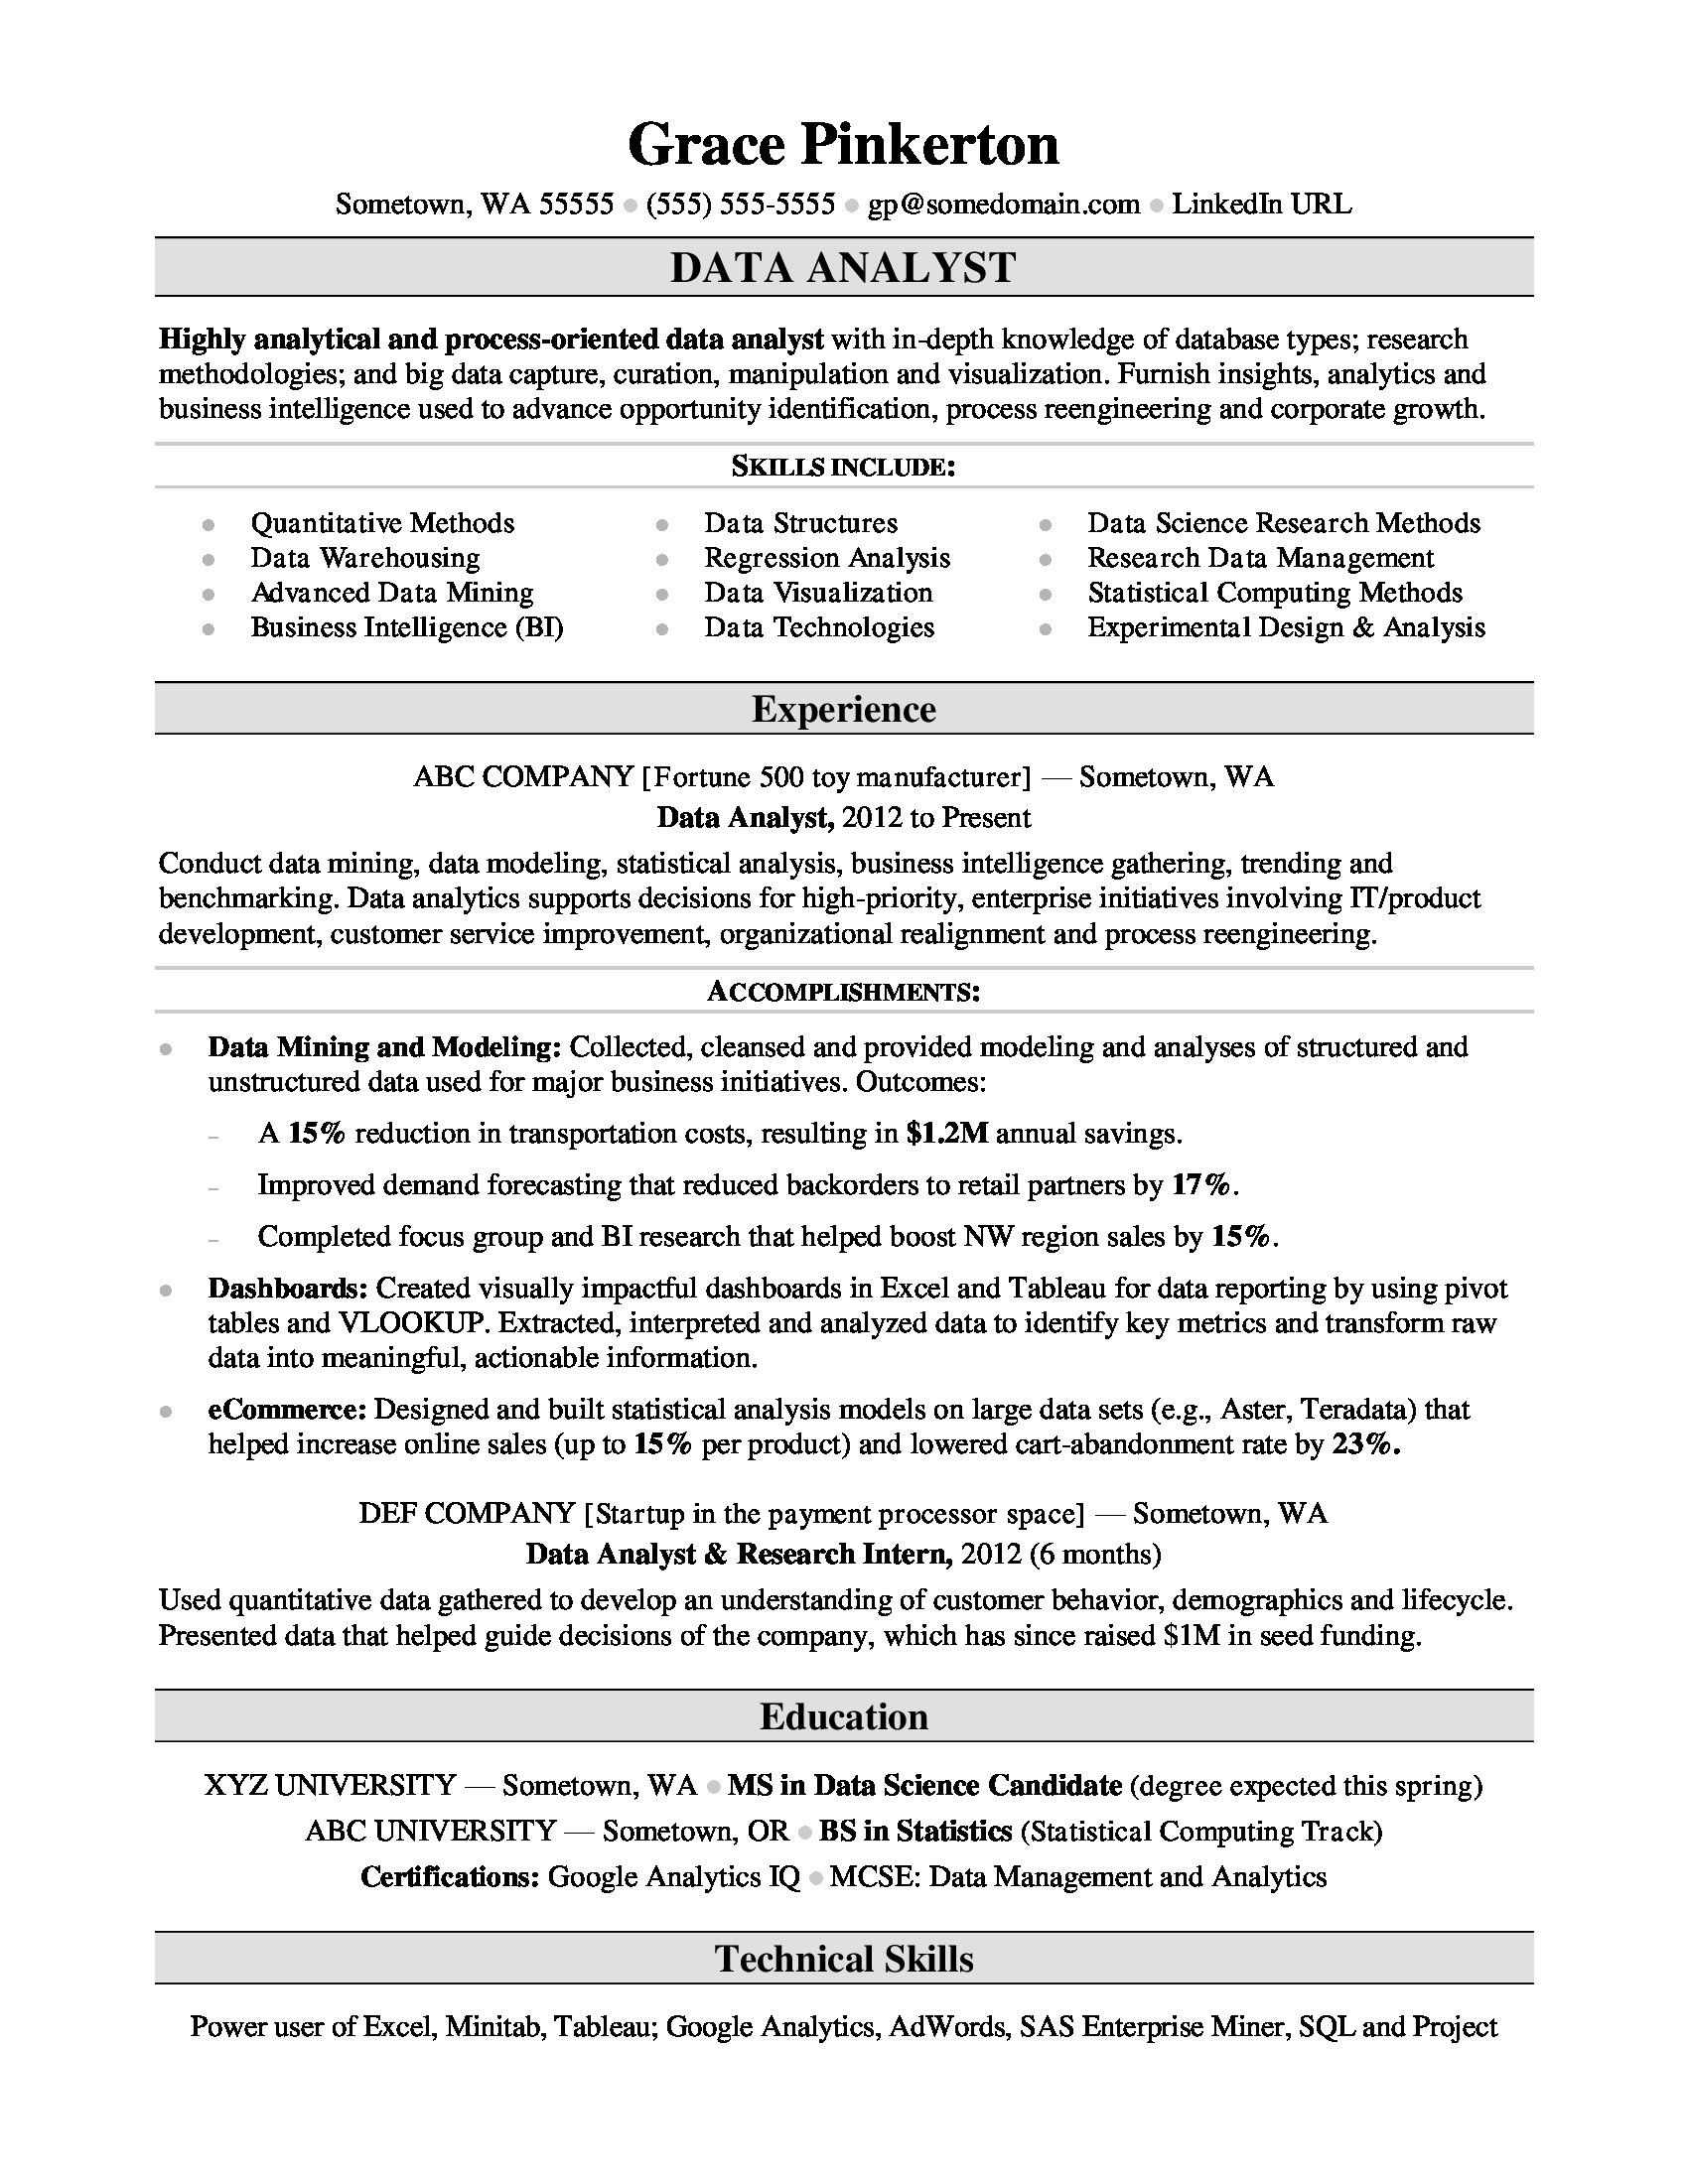 Data Analyst Resume Sample Data Analyst Business Analyst Resume Business Analyst